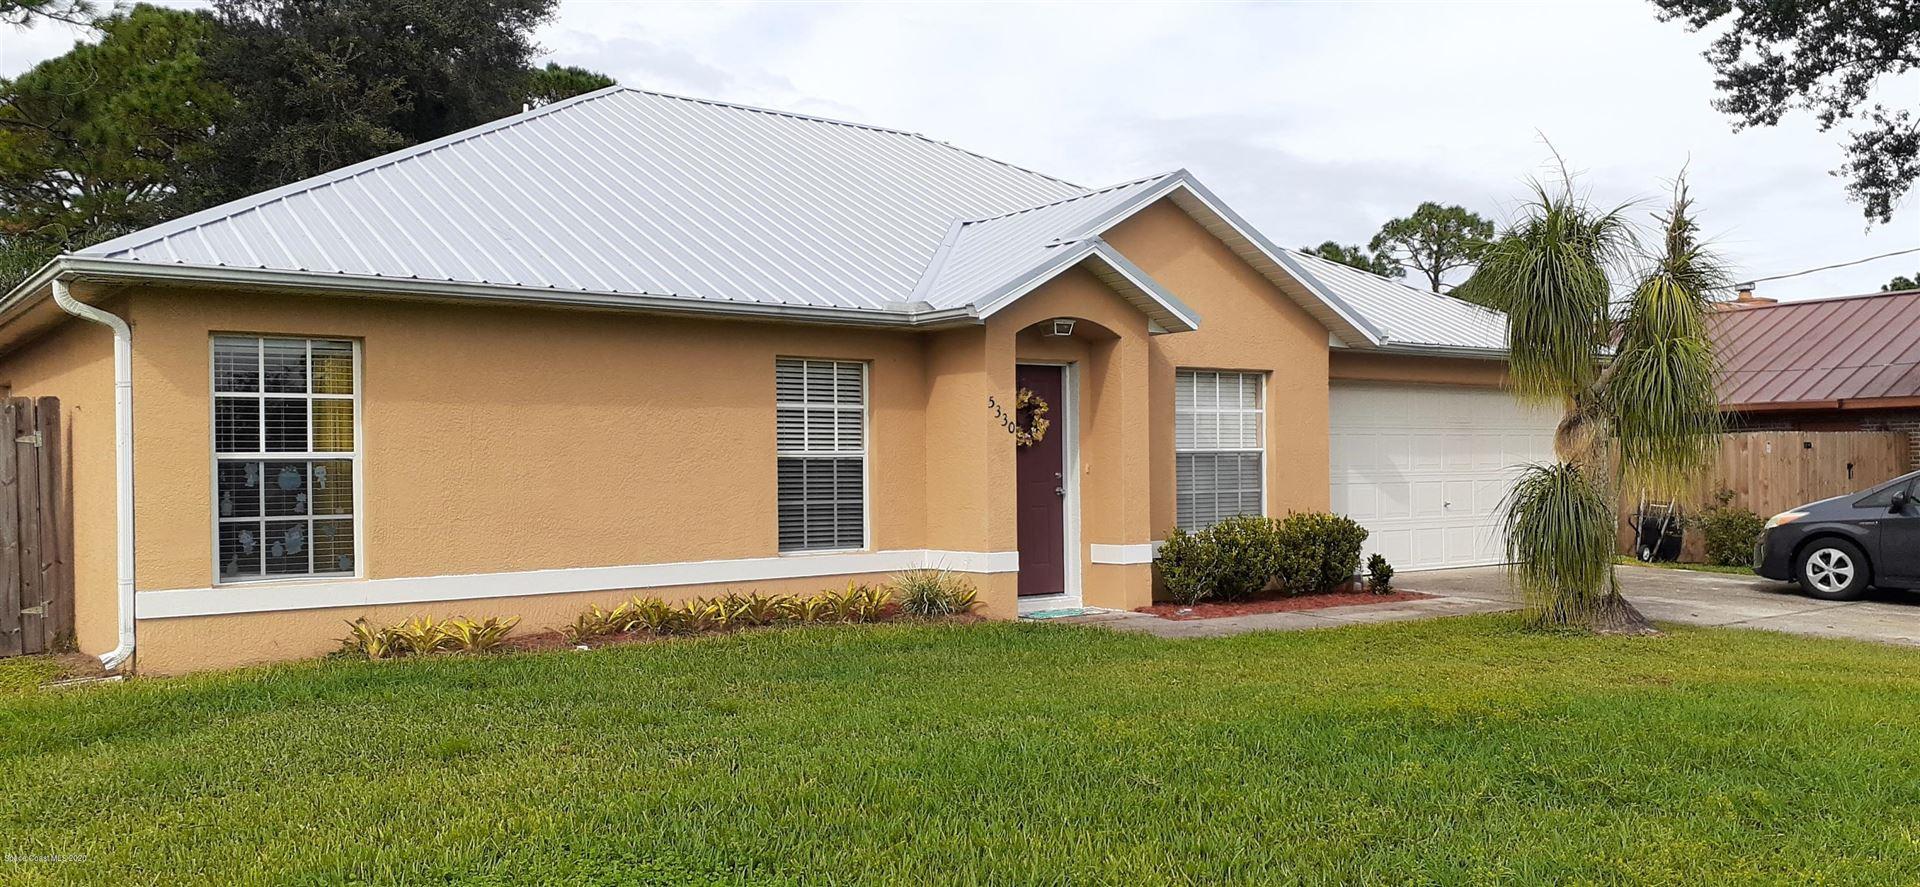 5330 Fruitport Street, Cocoa, FL 32927 - #: 887008